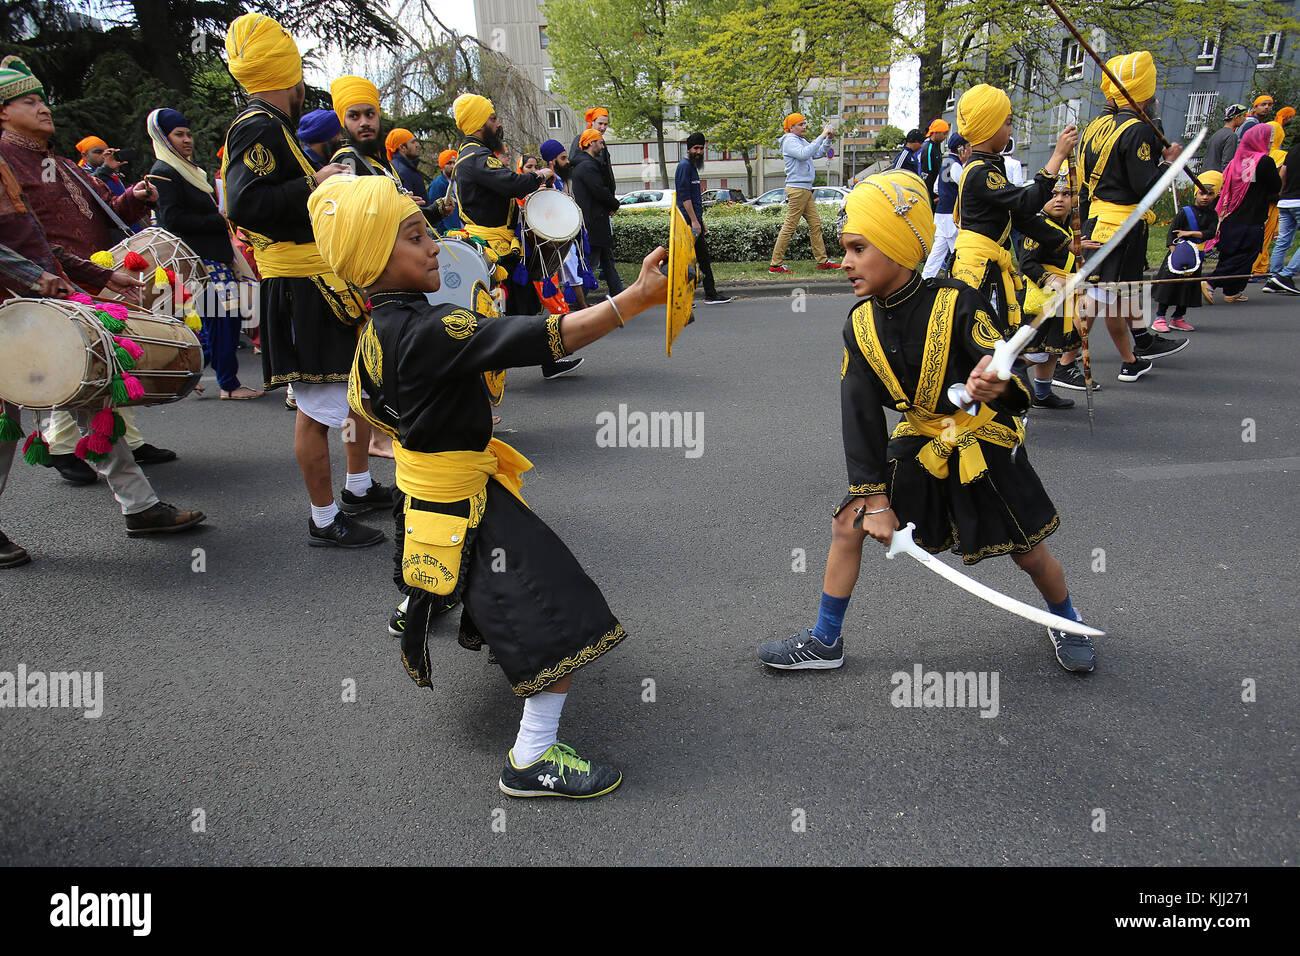 Sikhs celebrating Vaisakhi festival in Bobigny, France. Martial arts. - Stock Image